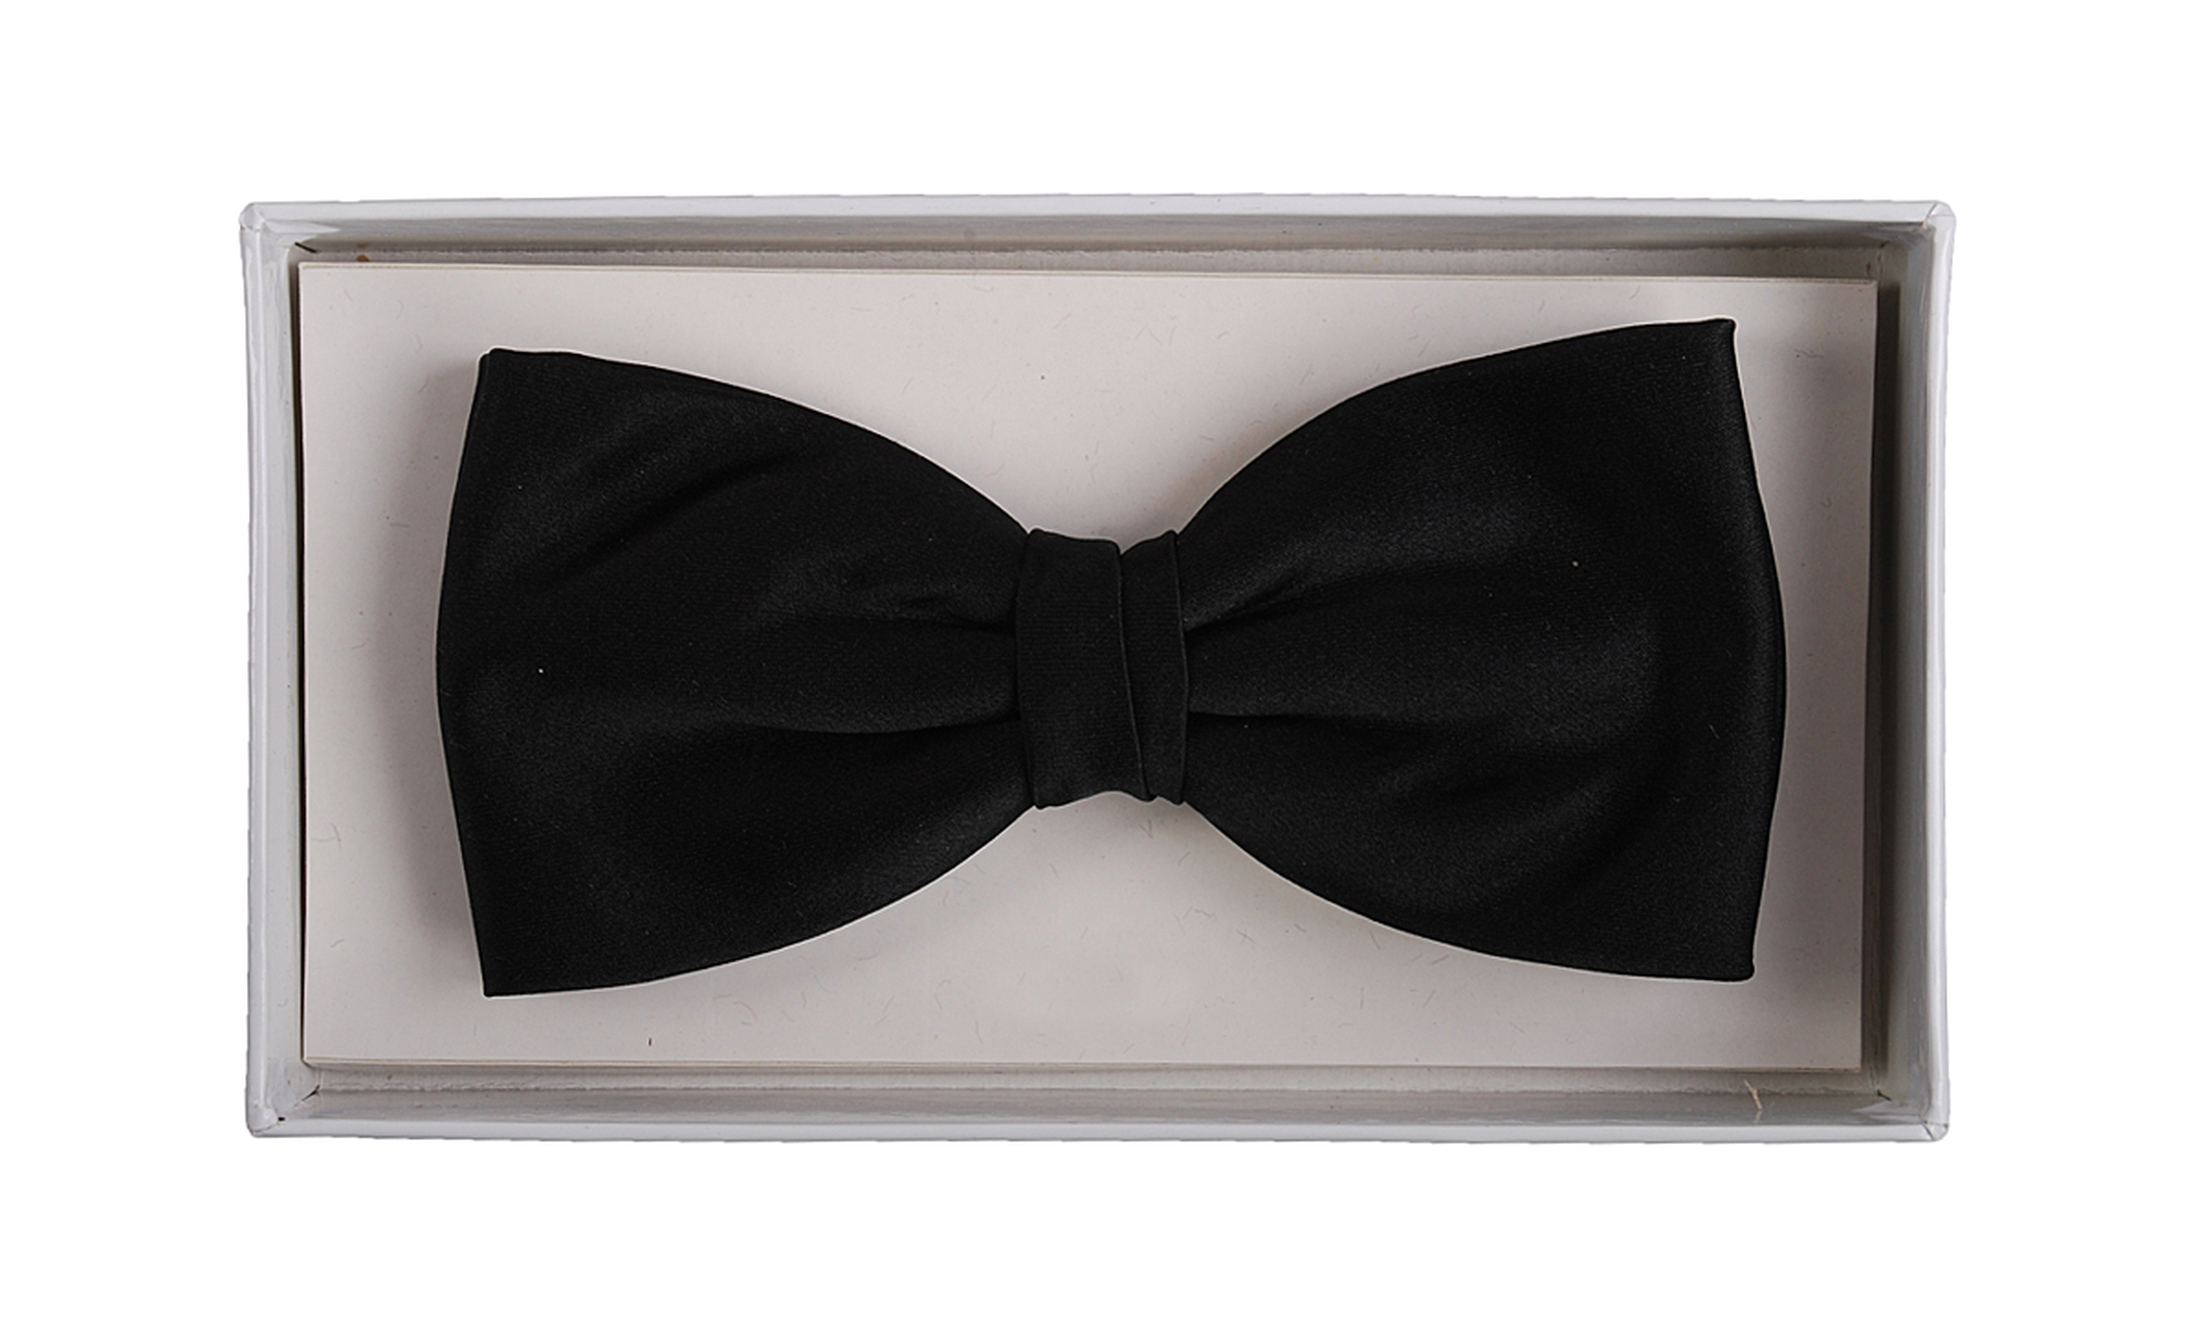 Bow Tie Black foto 1